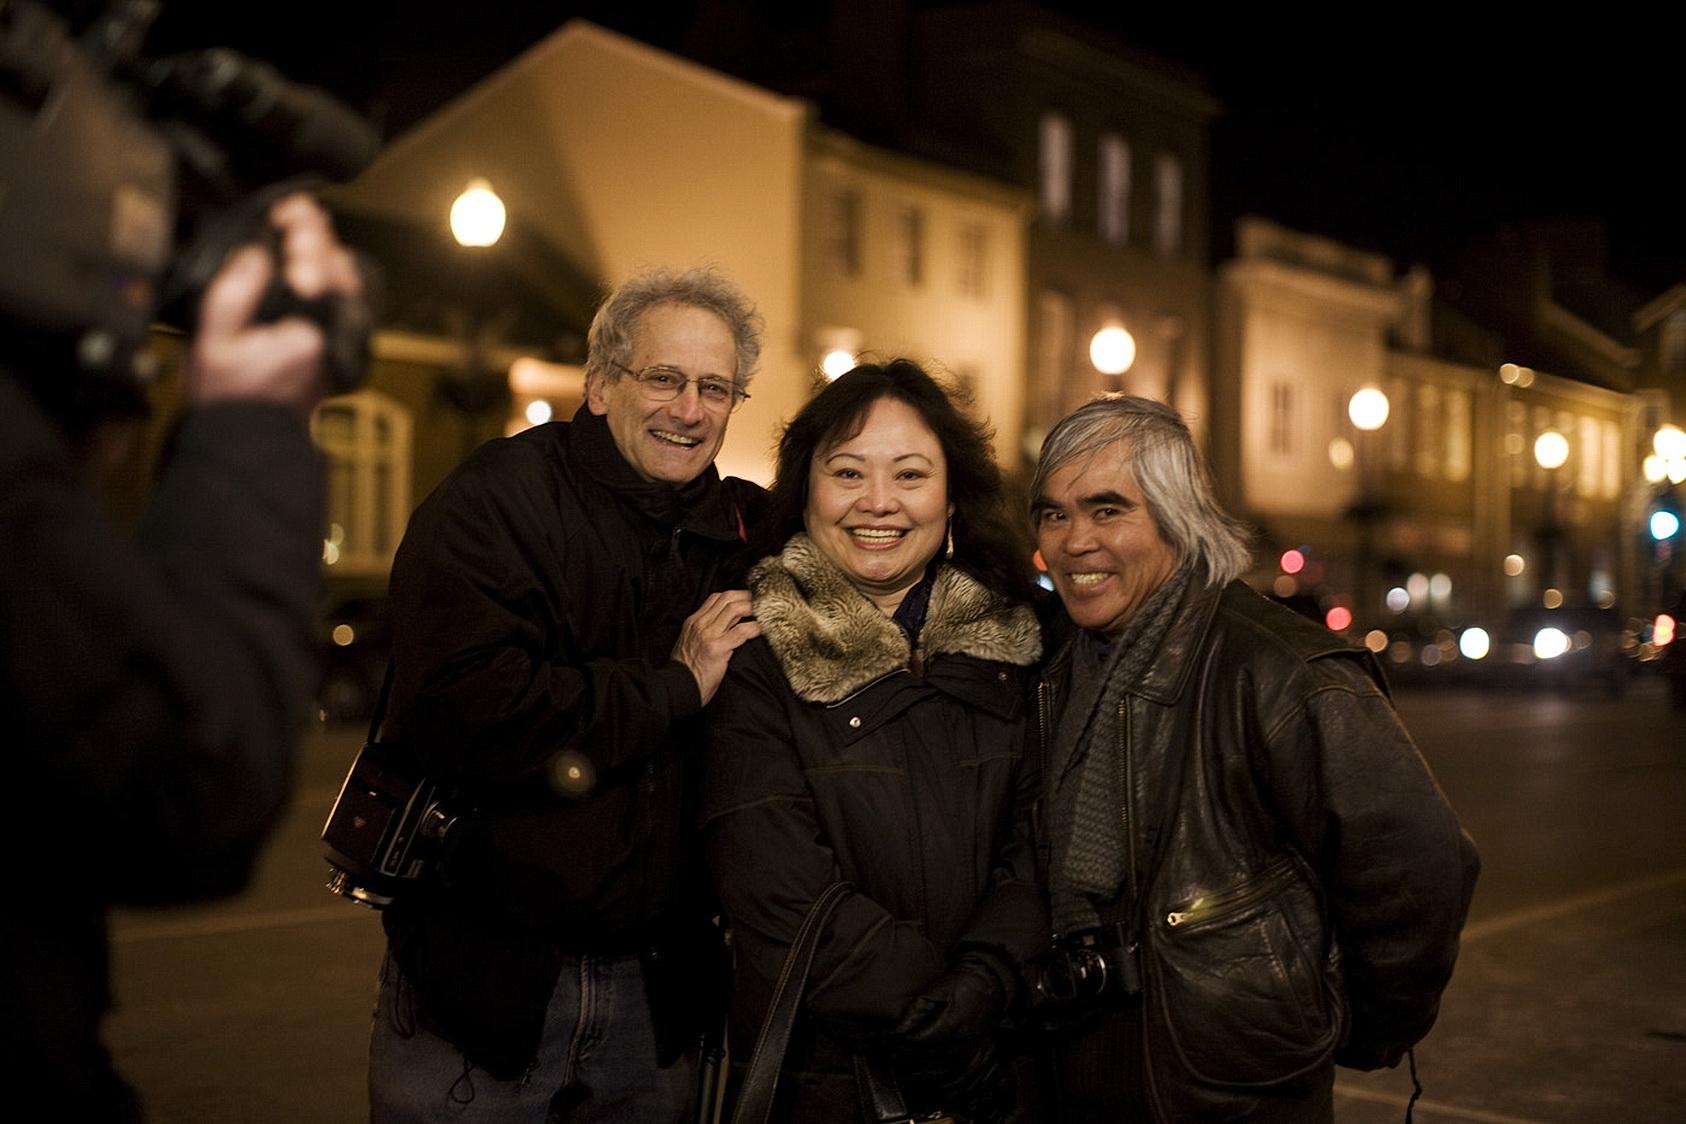 David Burnett, Kim Phuc and Nick Ut reunited in Washington DC, 2009 © Hyungwon Kang